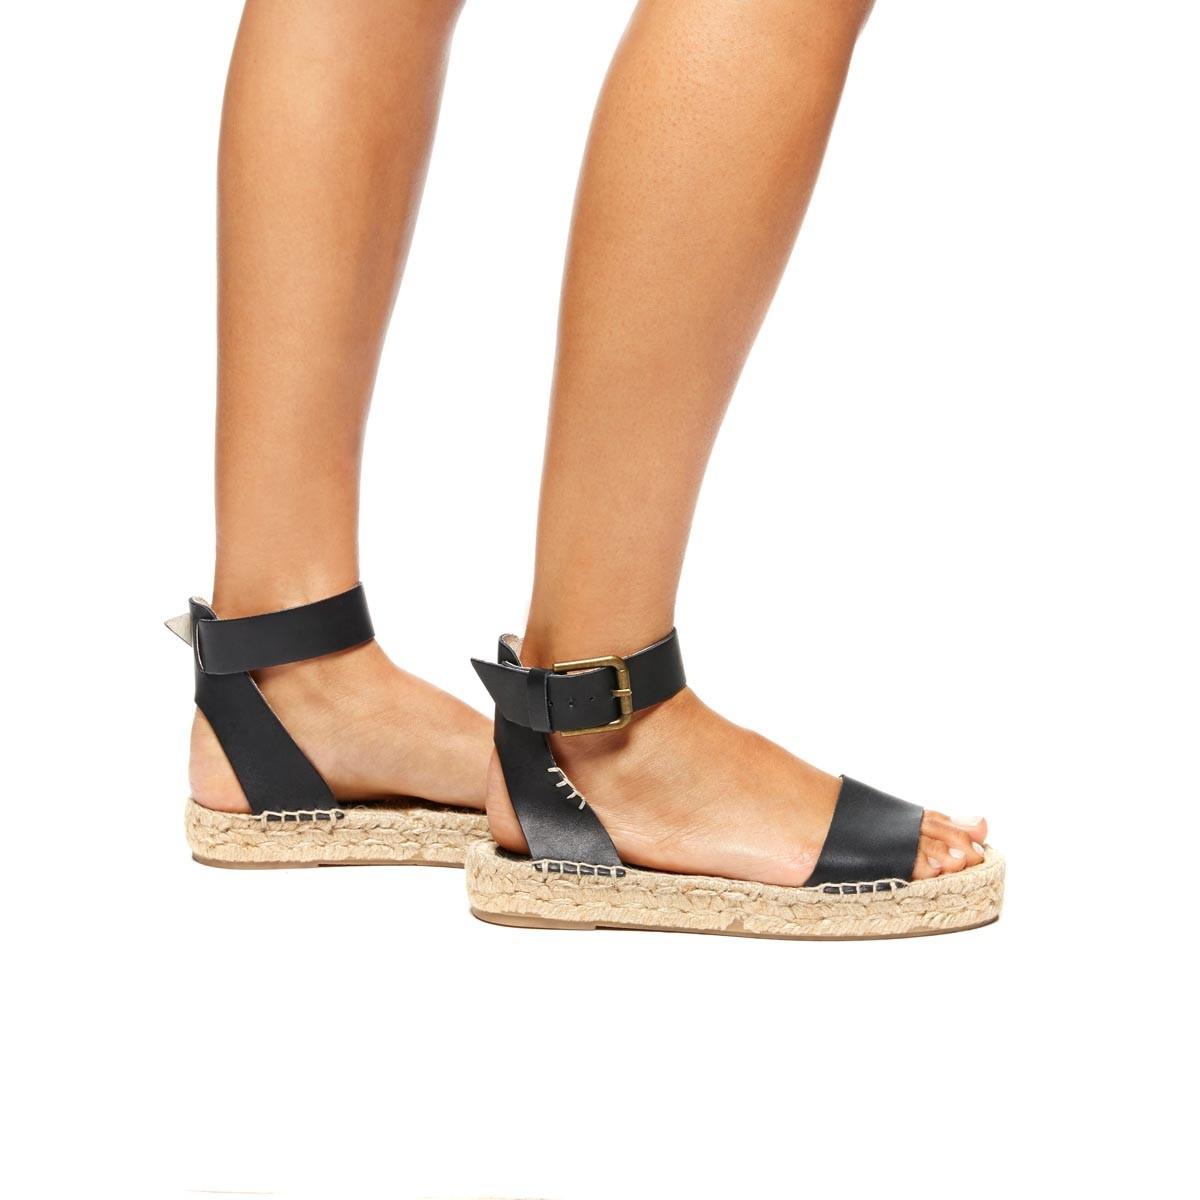 022803fb31b Lyst - Soludos Platform Open Toe Sandal in Black